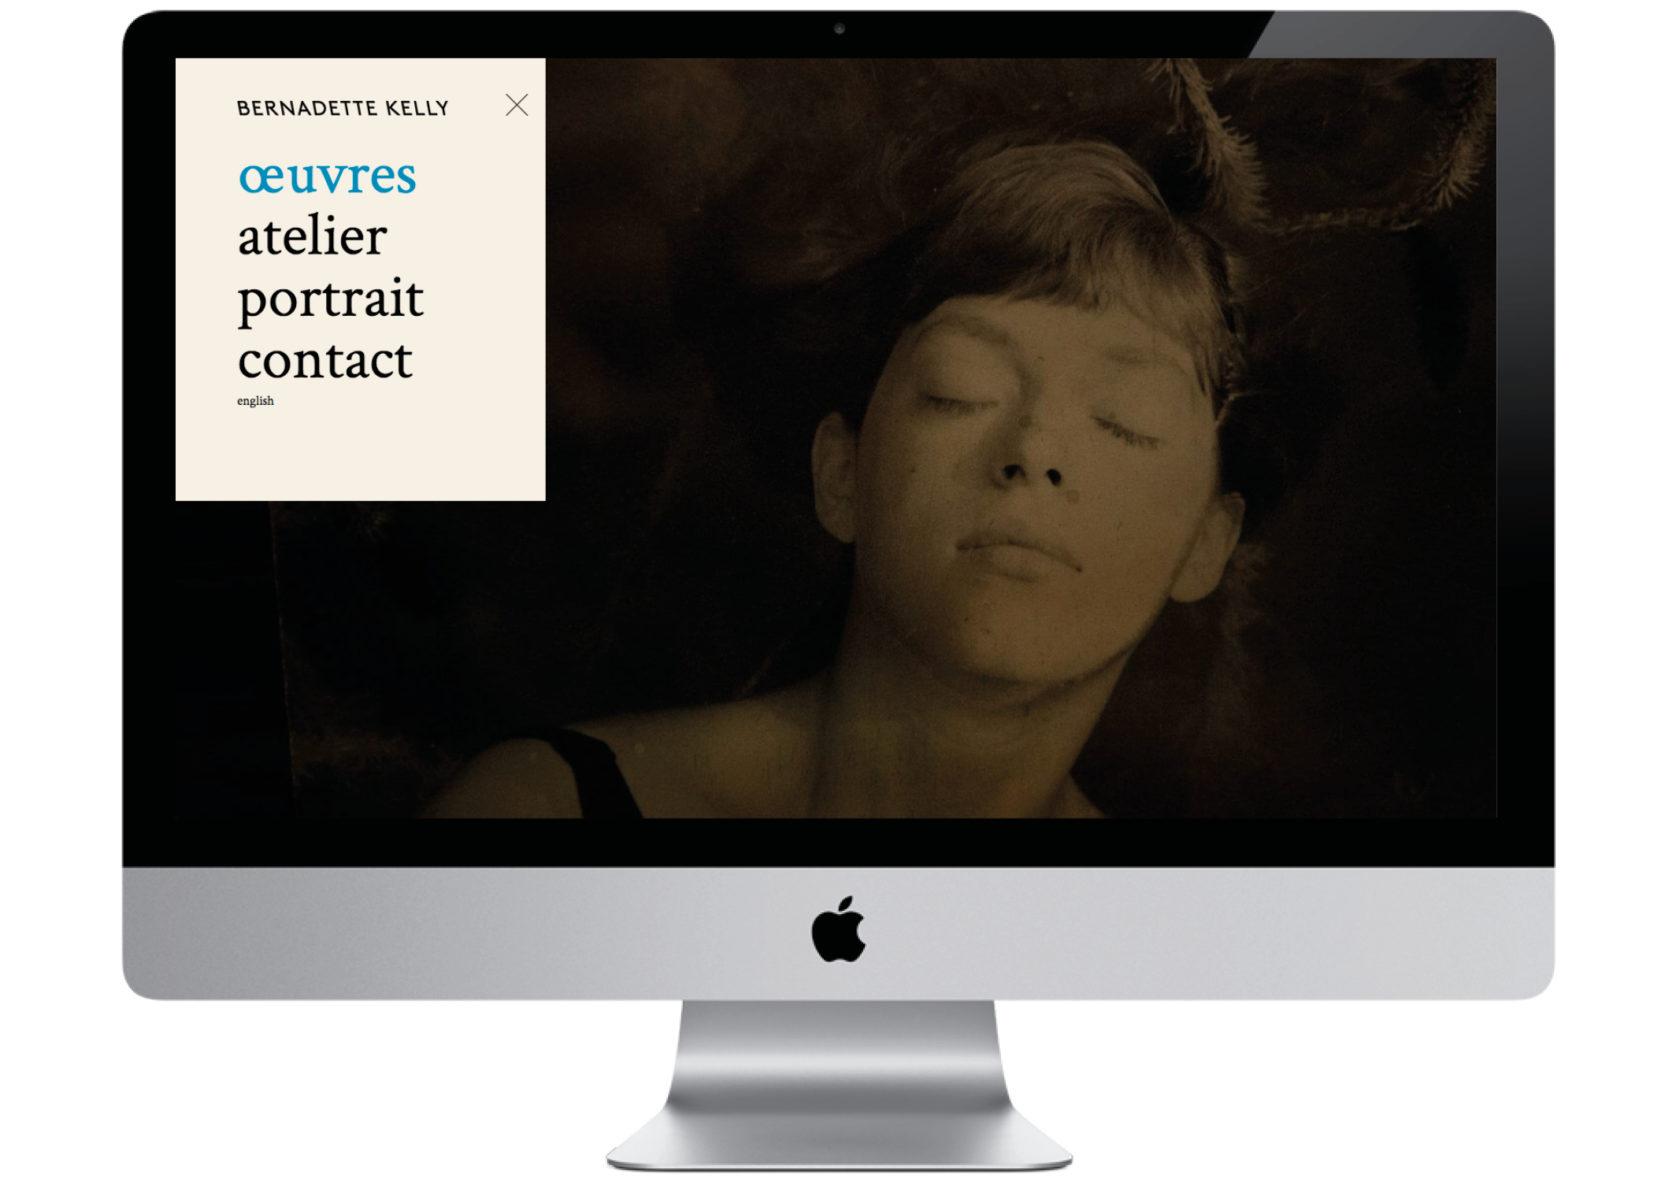 fouinzanardi - fz_web_imac_bernadettekelly_5